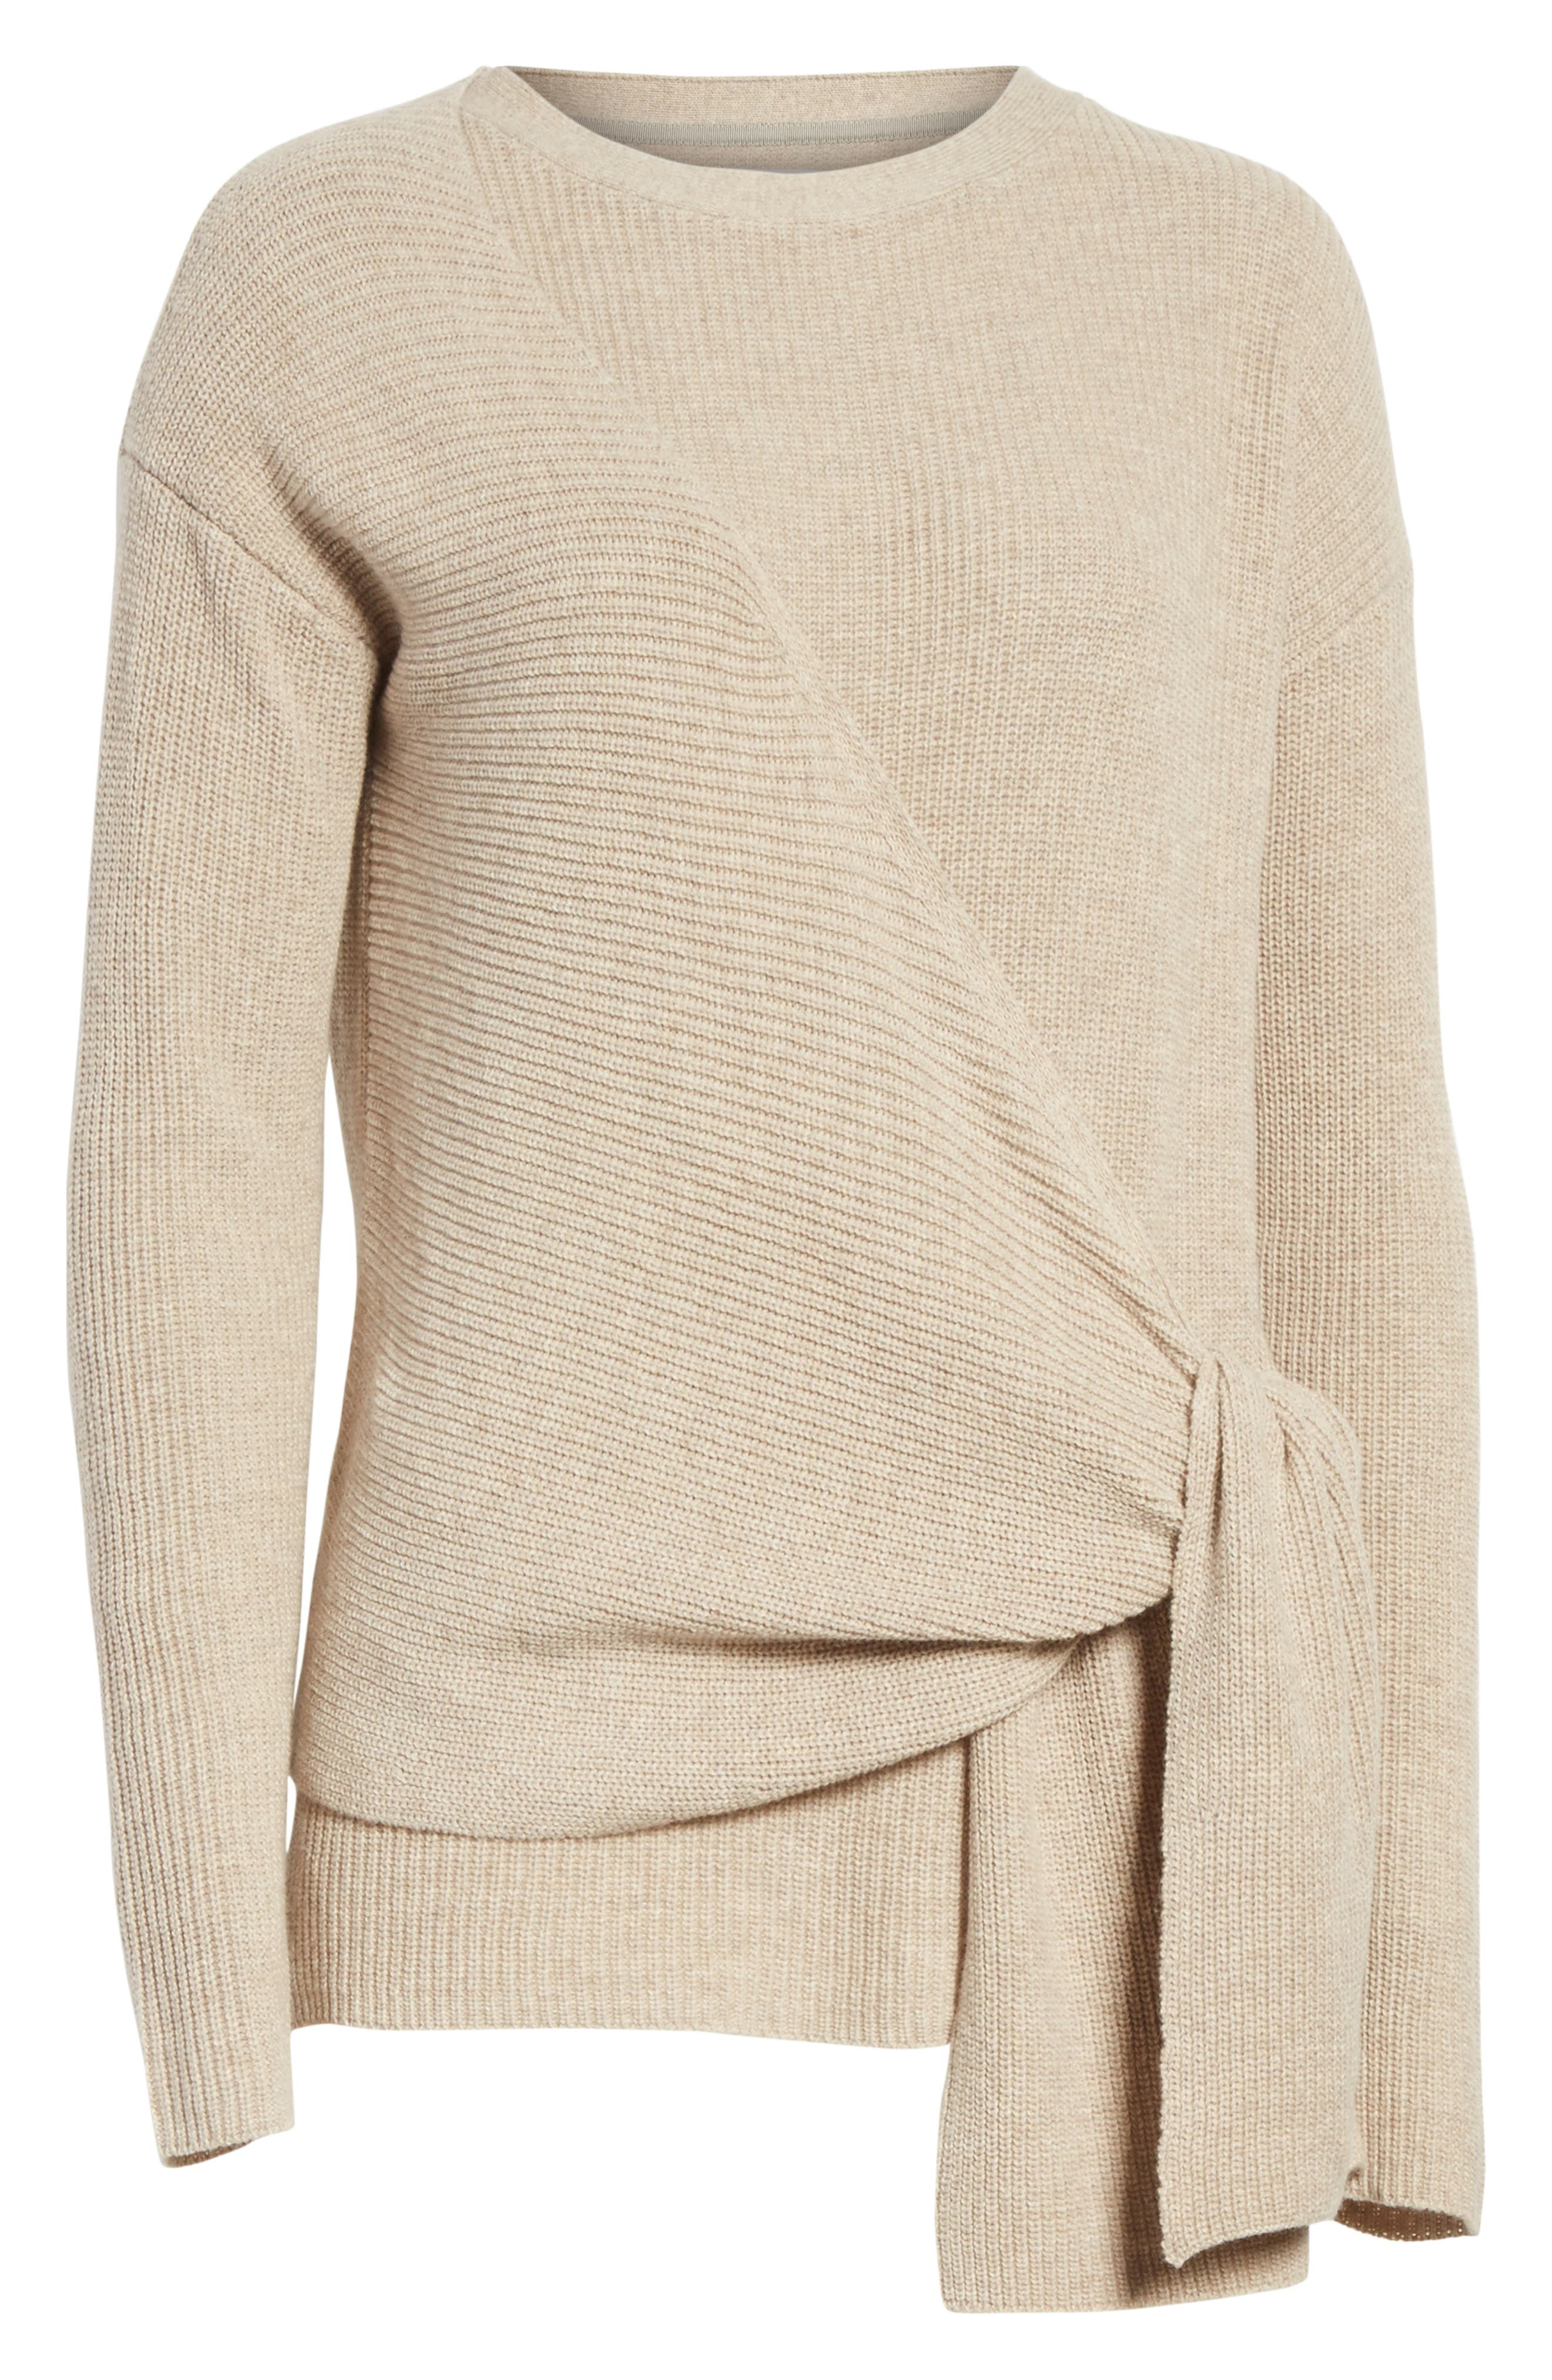 Greys Wrap Sweater,                             Alternate thumbnail 6, color,                             270